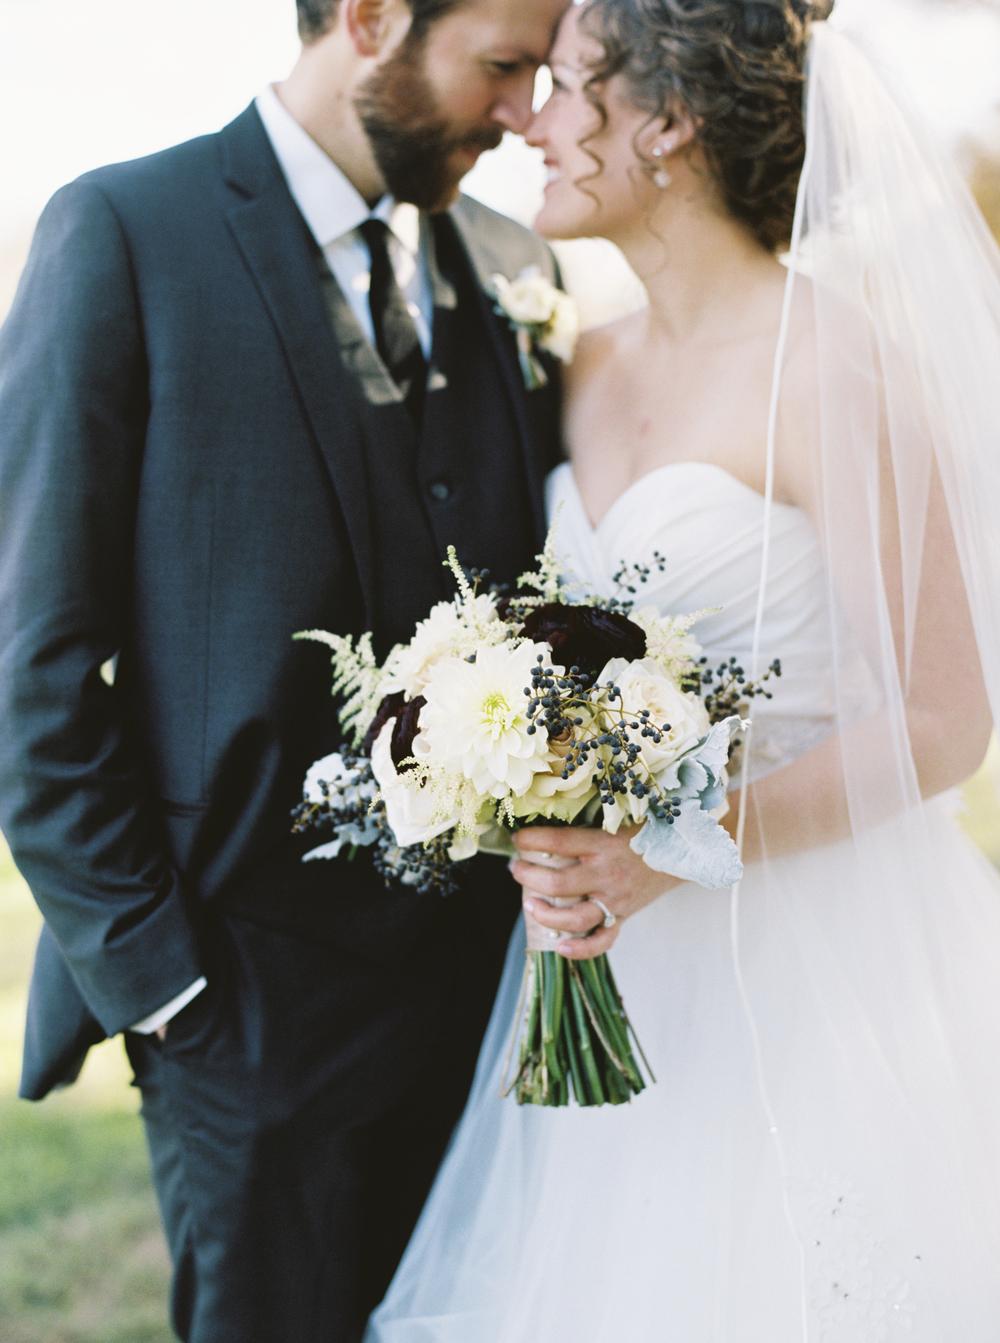 Bride&Groom33Cortney B Photography.JPG